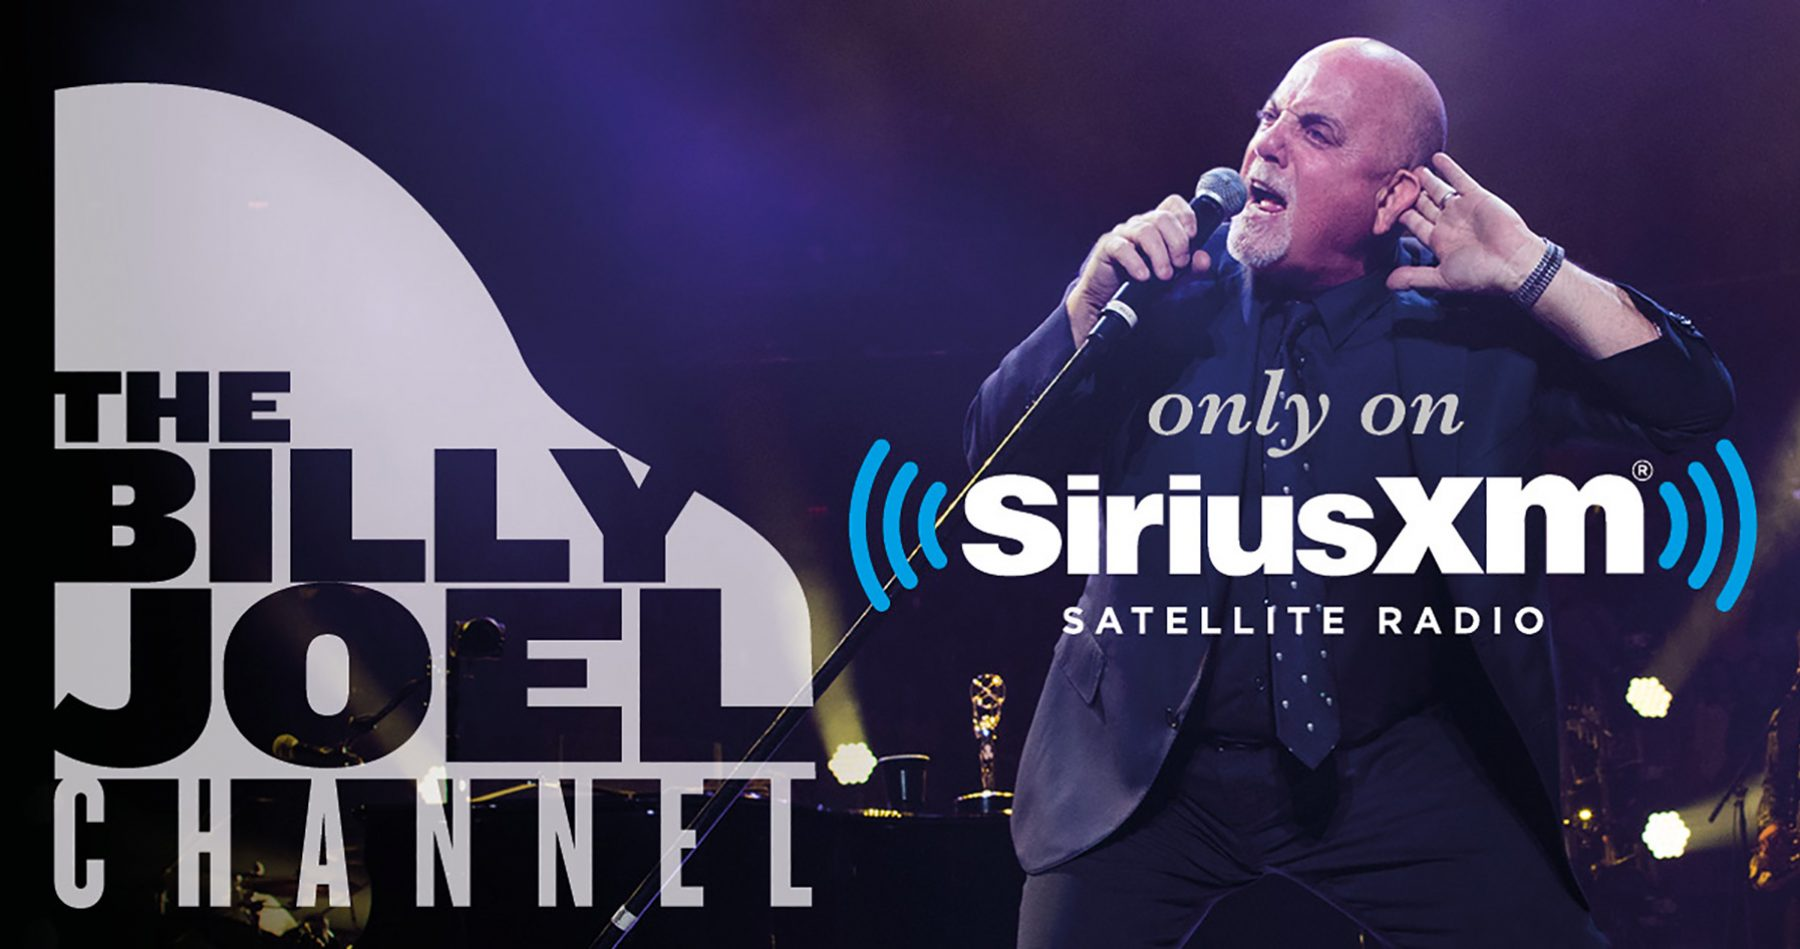 The Billy Joel Channel on SiriusXM